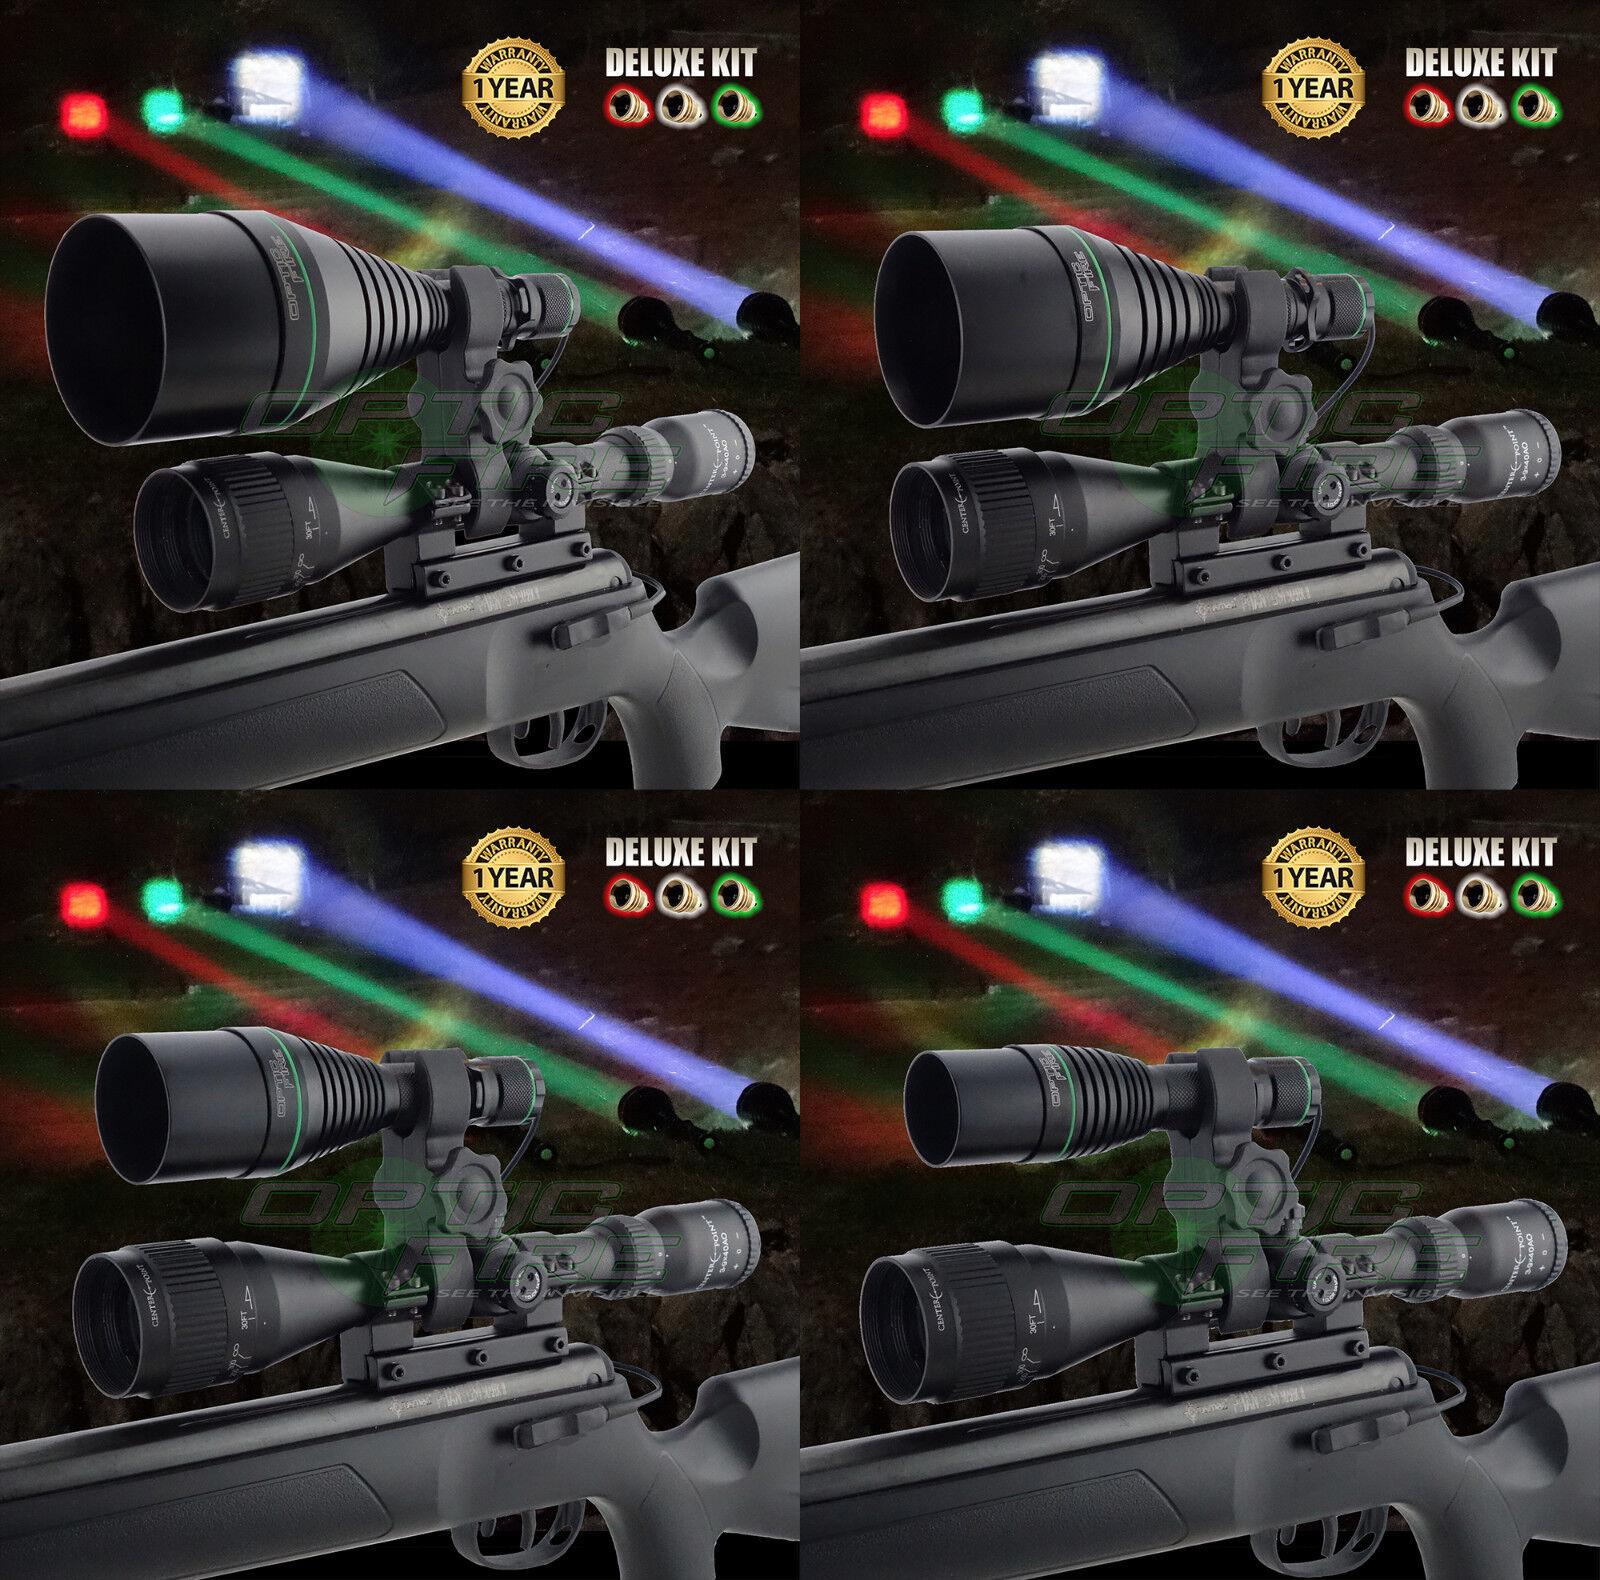 Opticfire ® XS 3 LED luce portata Mount PISTOLA Lampada Torcia da caccia Lamping DELUXE KIT